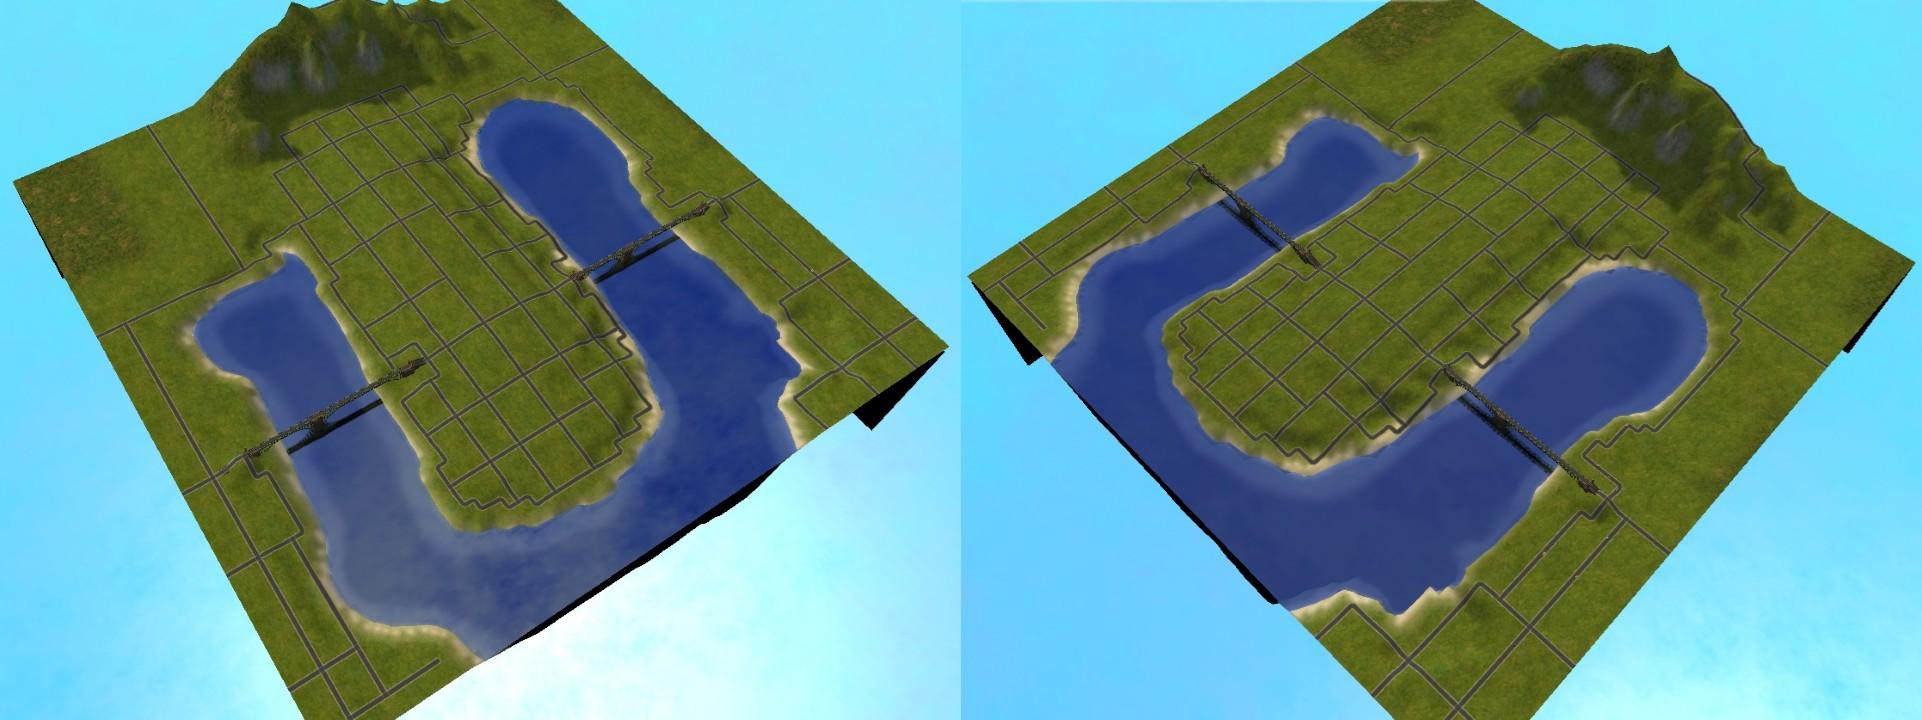 Mod The Sims - Sim City